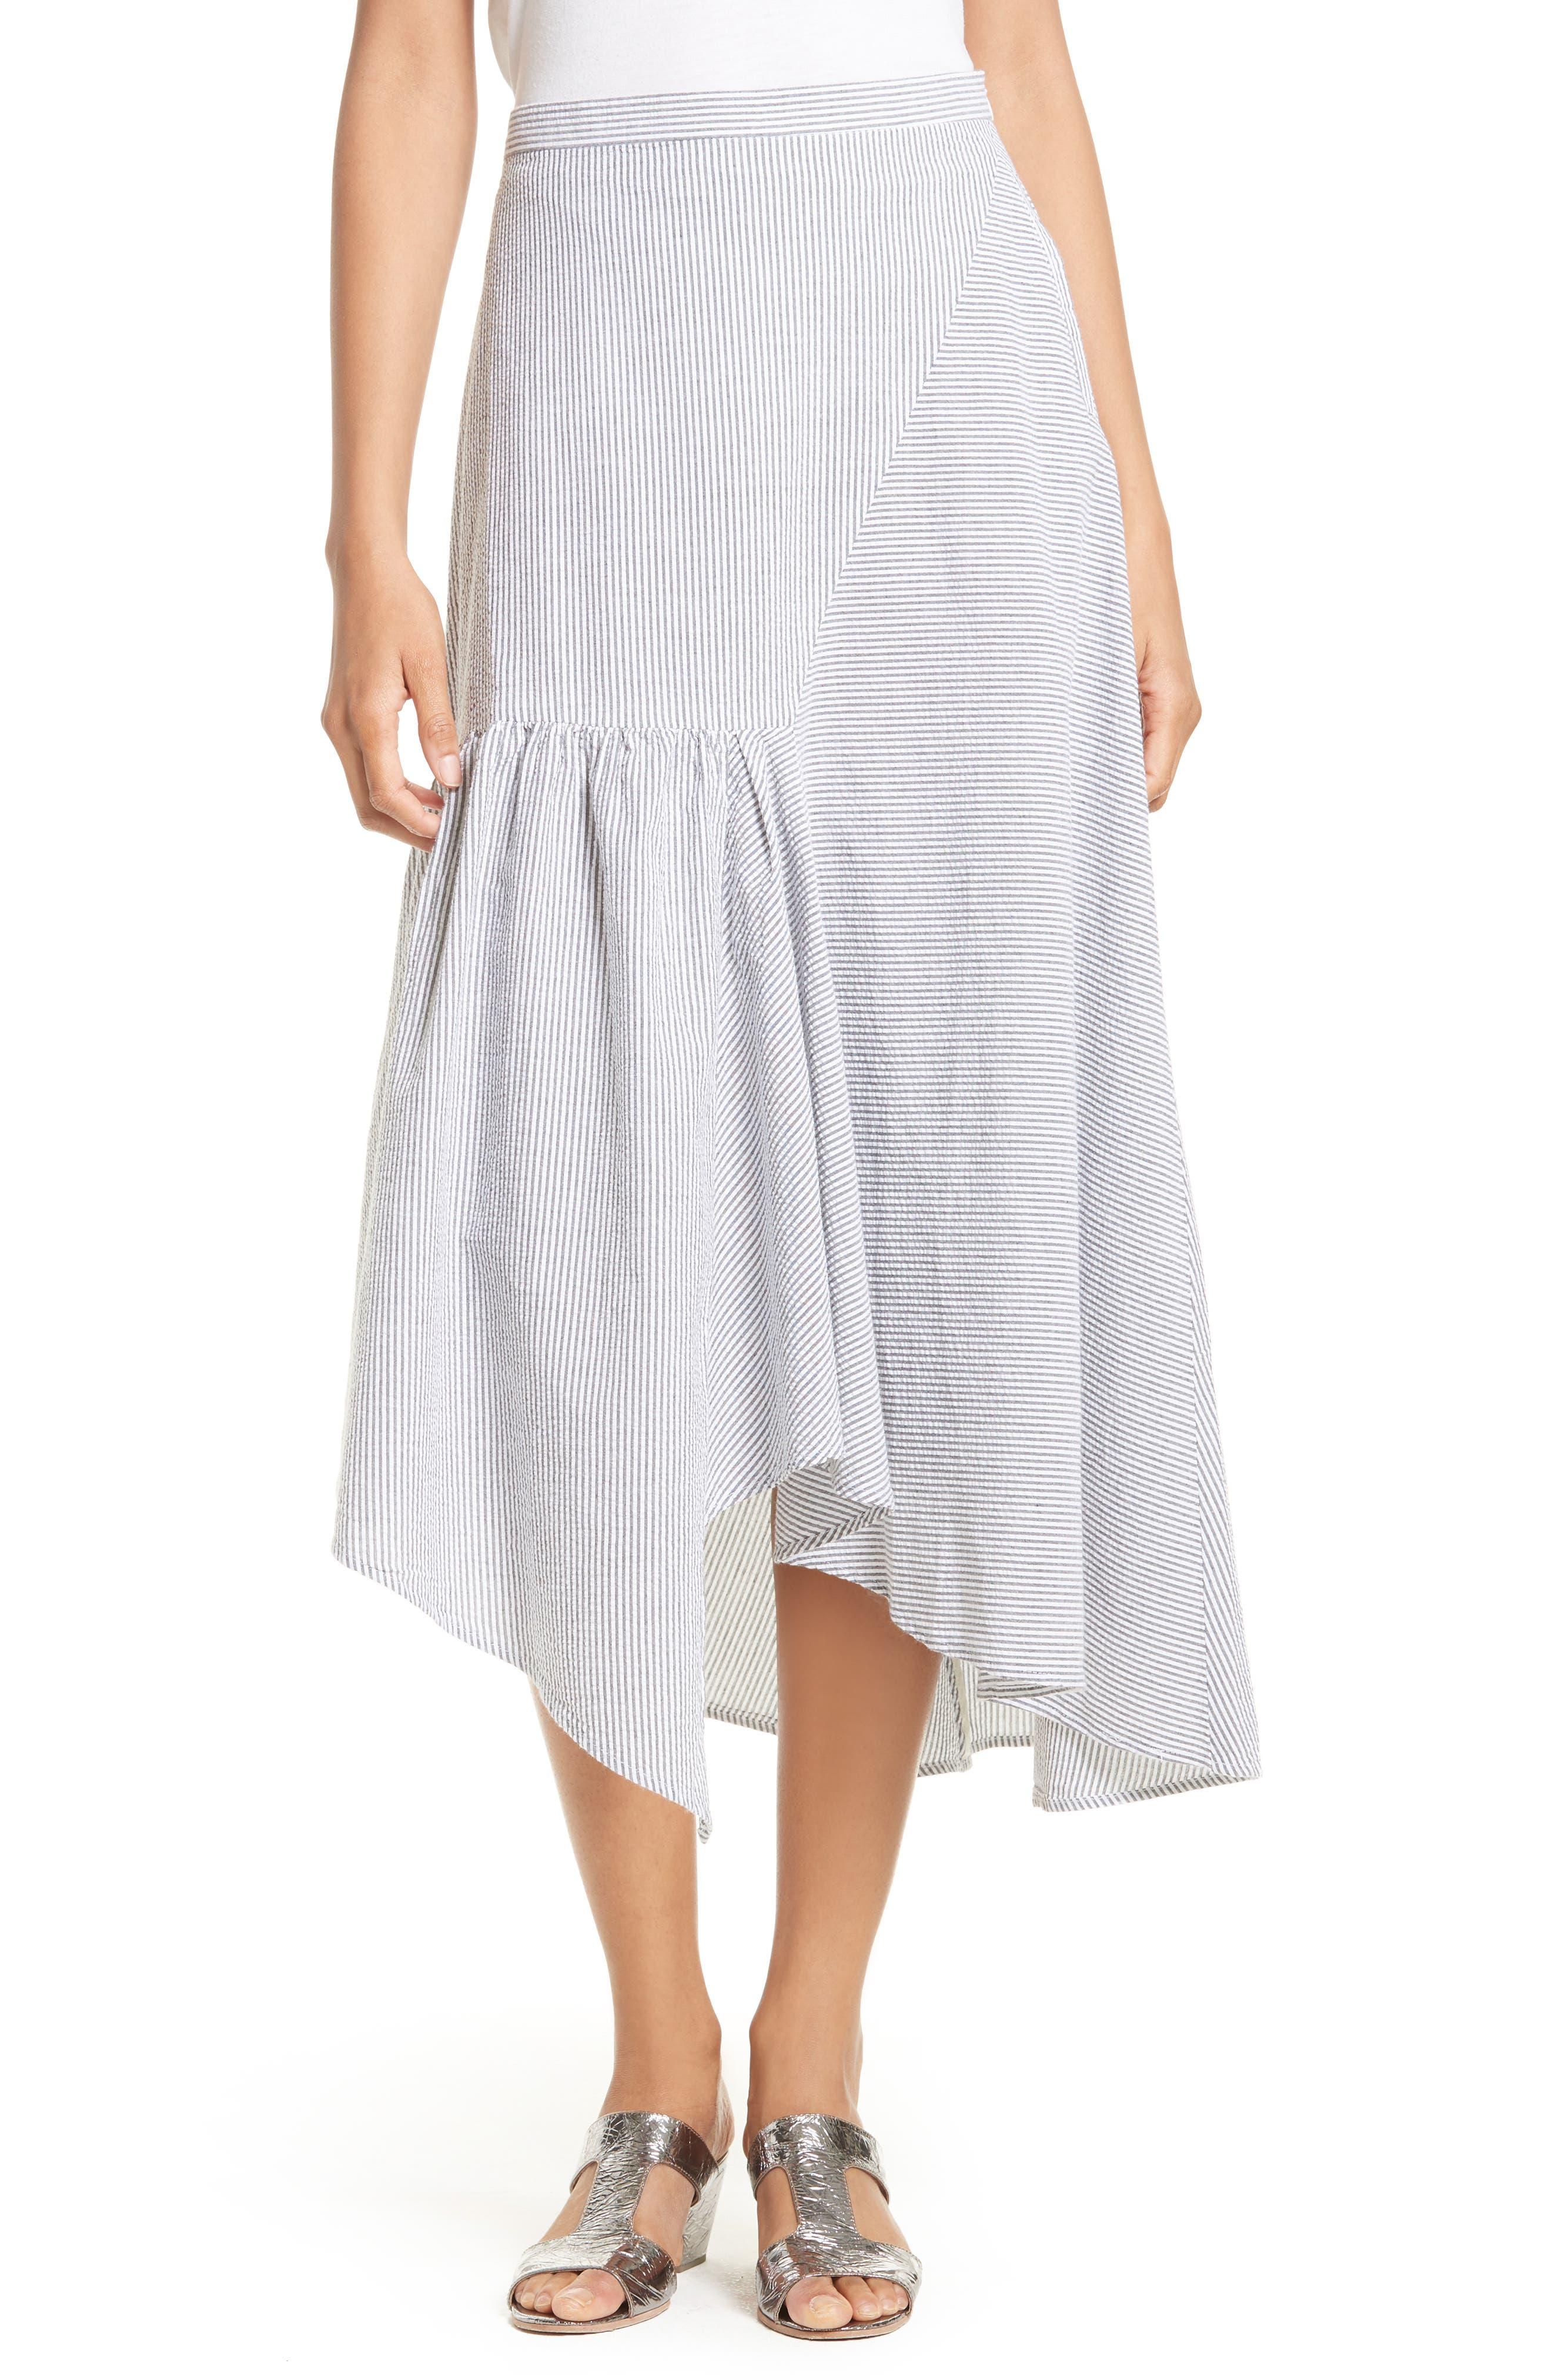 Rachel Comey Steady Seersucker Midi Skirt